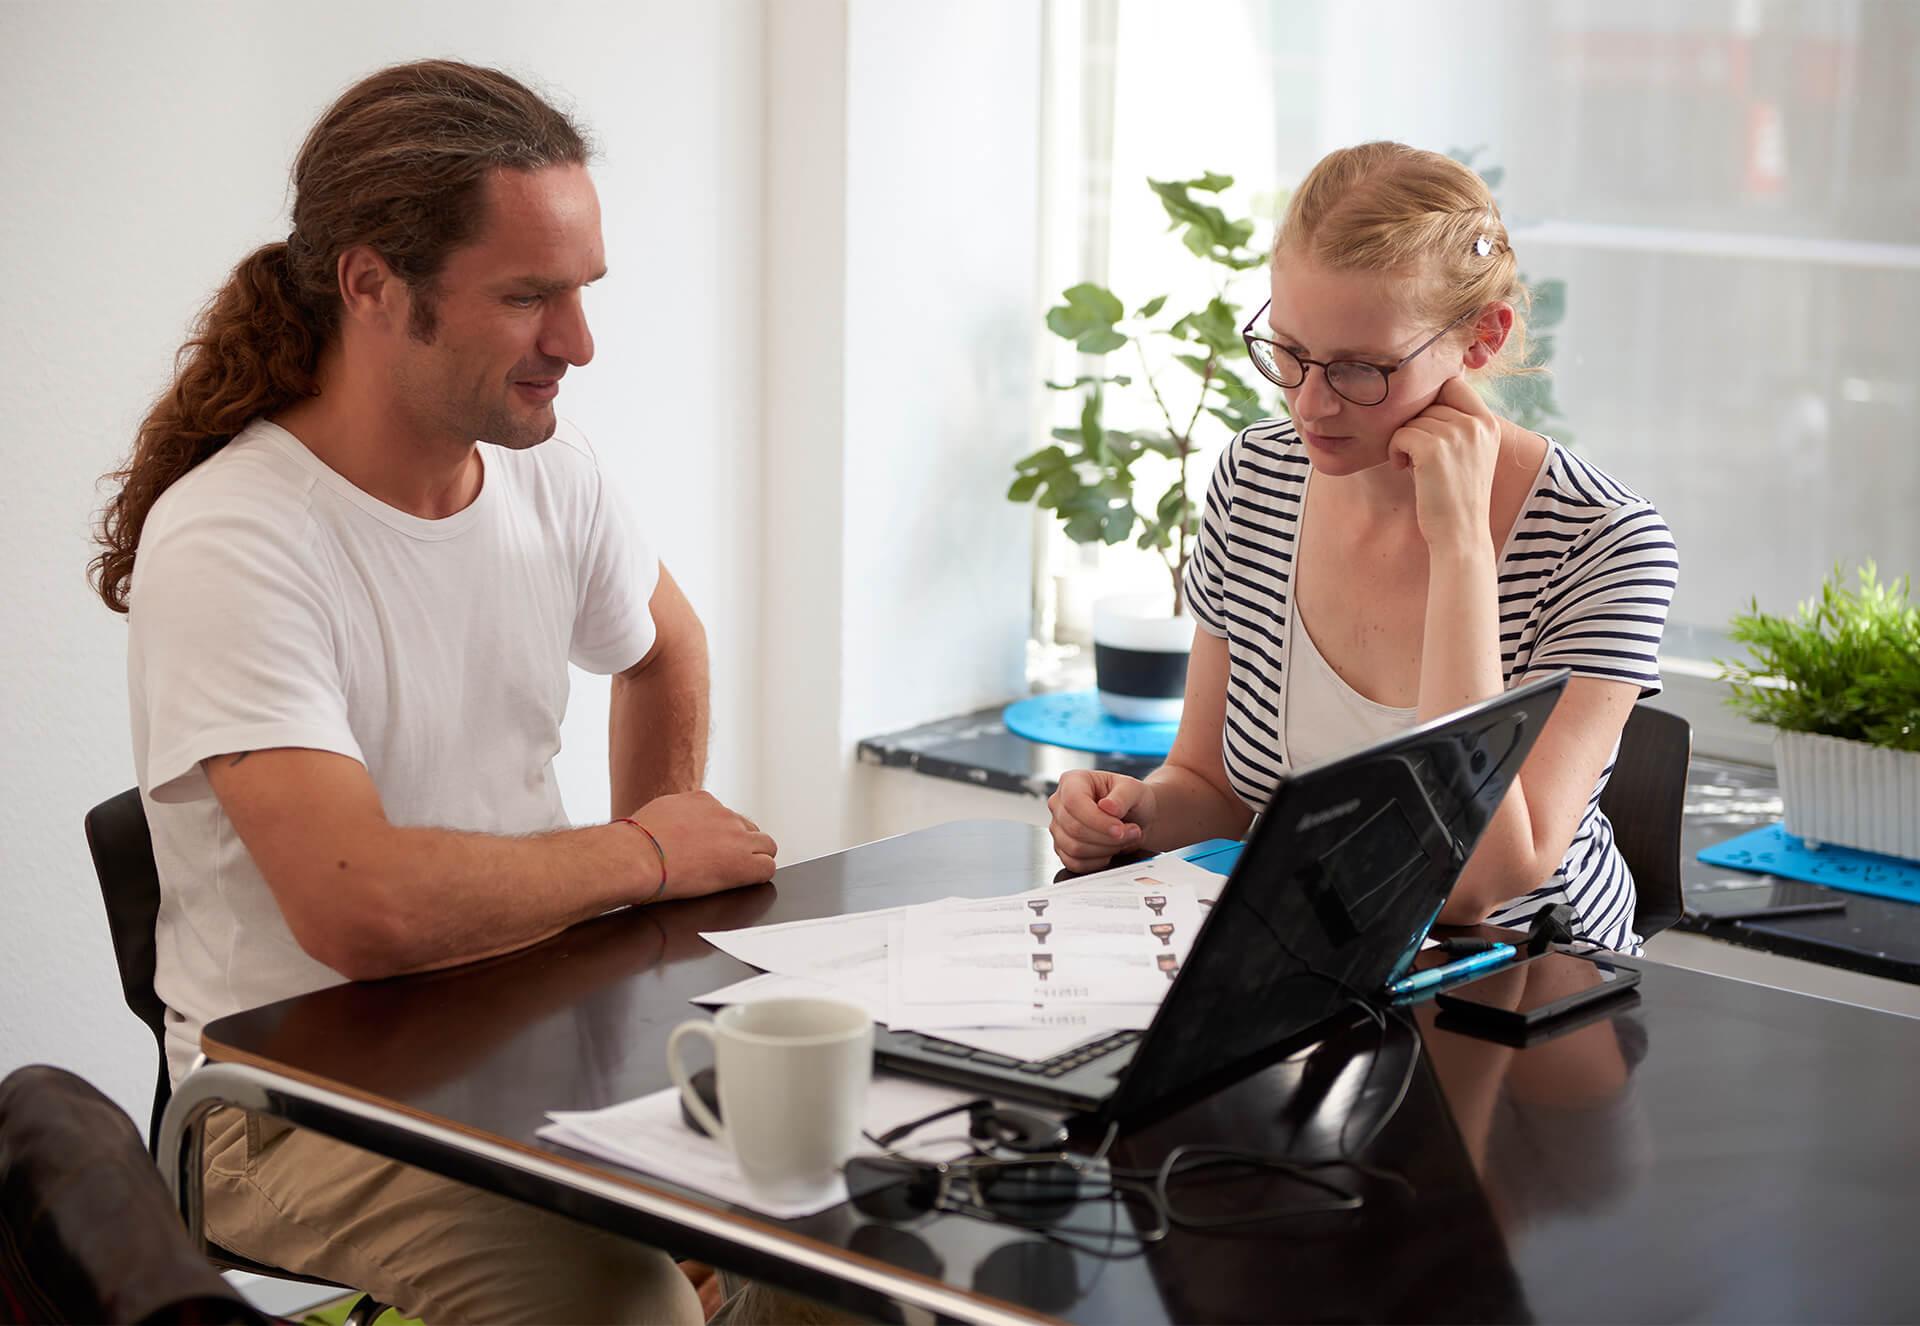 jaryd-fisher-meeting-room-coworking